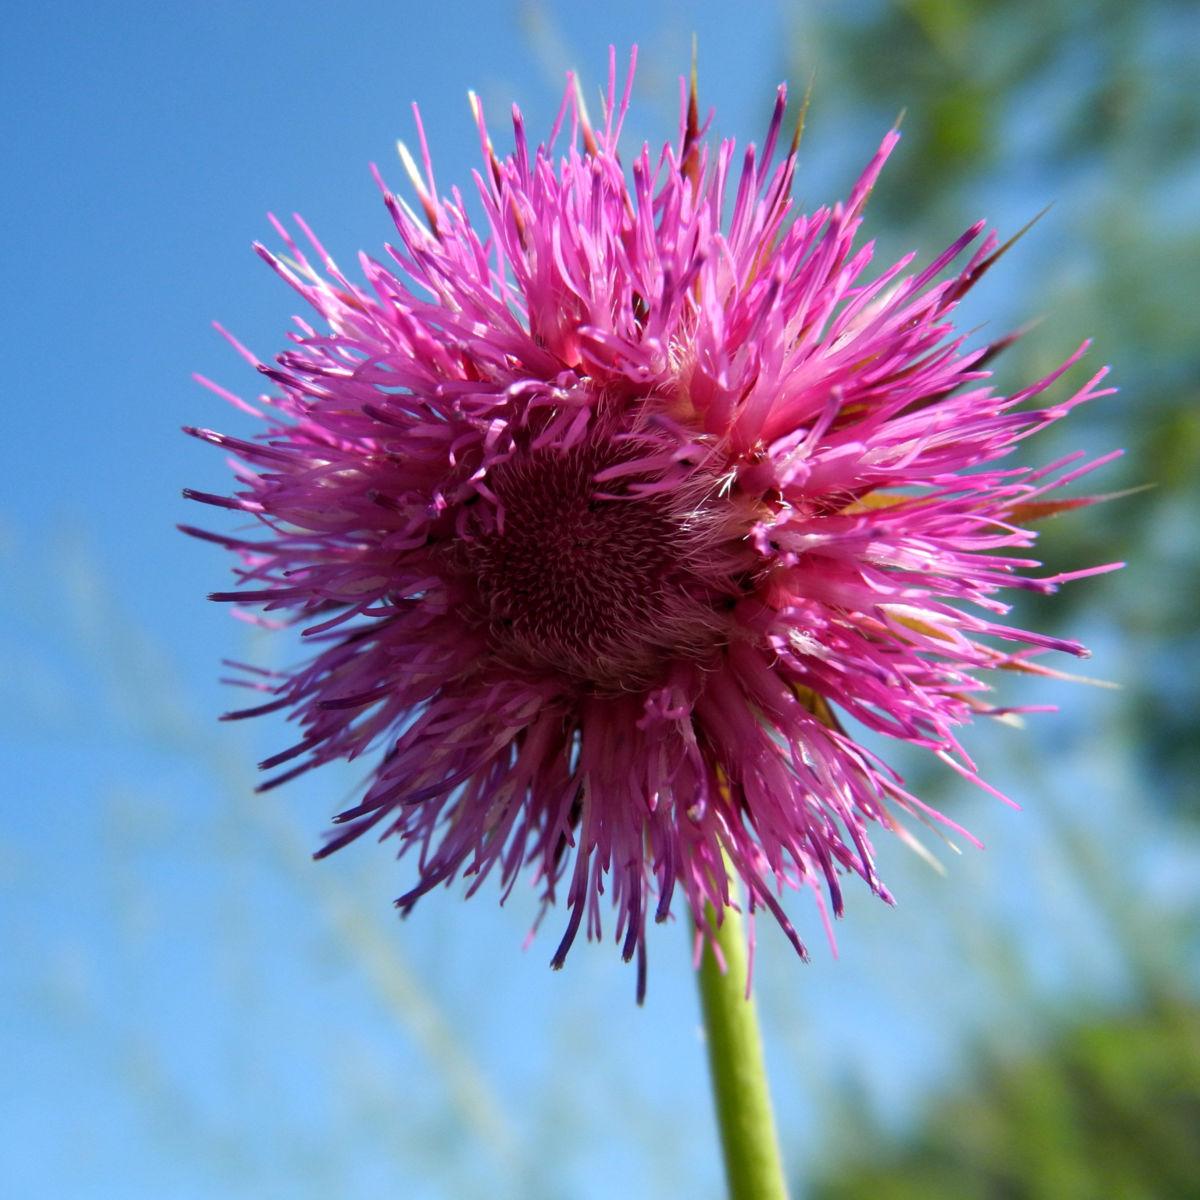 Nickende Distel Bluete stachelig lila Carduus nutans